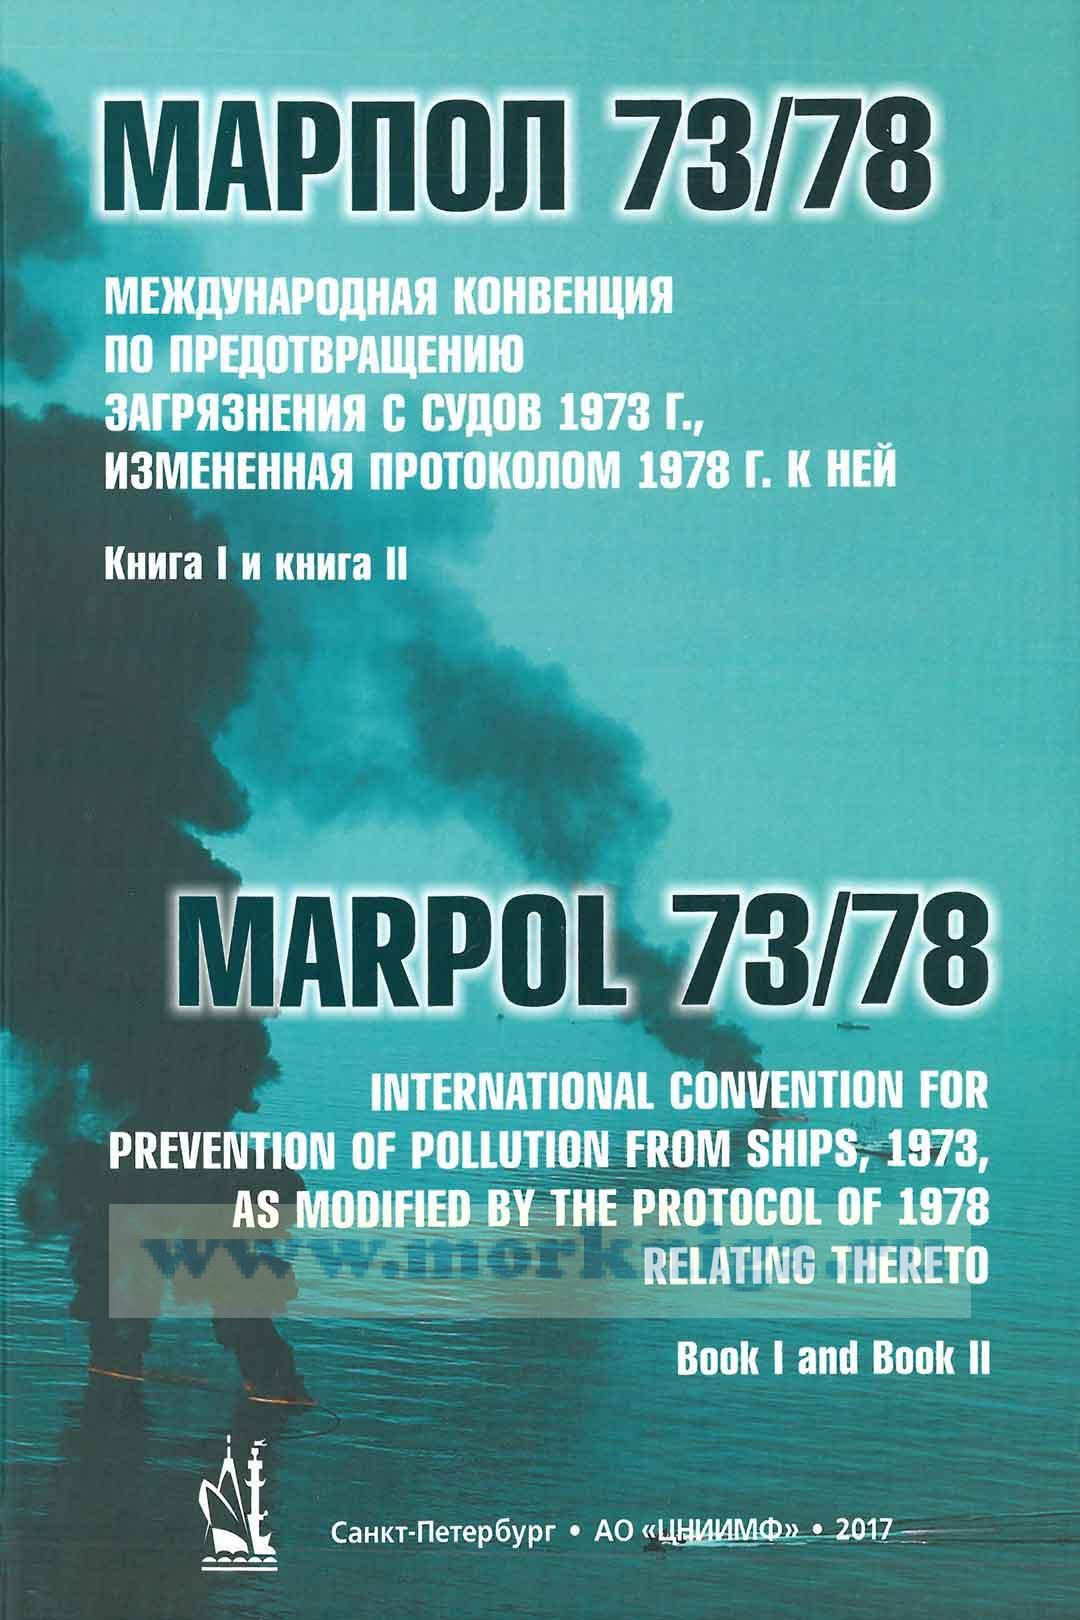 Международная Конвенция по предотвращению загрязнения с судов 1973 г., измененная протоколом 1978 г. к ней (МАРПОЛ-73/78). International Convention for Prevention of Pollution from Ships,1973, as Modified by the Protocol of 1978 relating thereto (MARPOL 7. Книга I, II